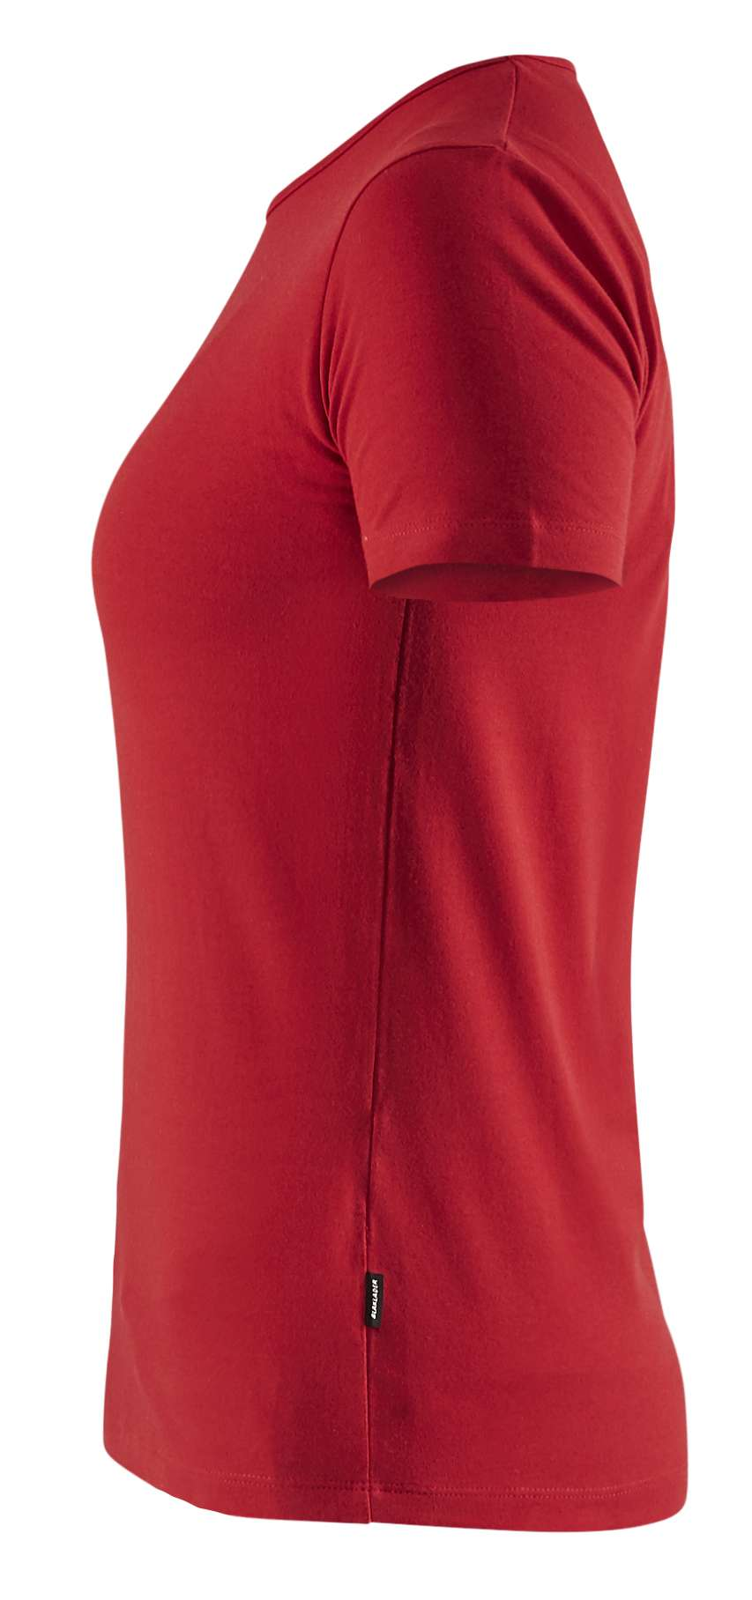 Blaklader Dames T-shirts 33041031 rood(5600)